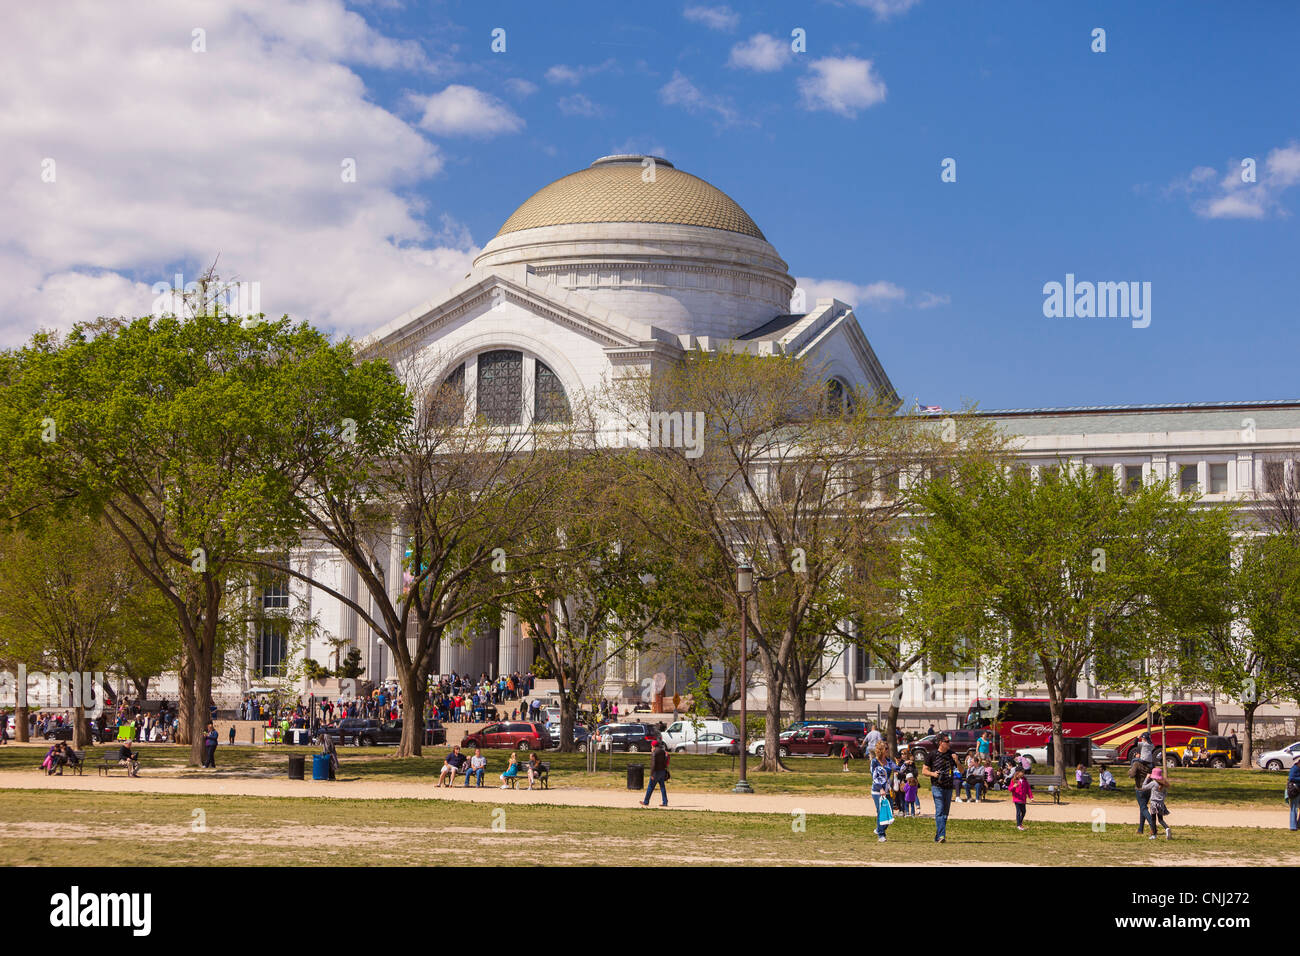 WASHINGTON, DC, USA - Smithsonian Museum of Natural History. - Stock Image